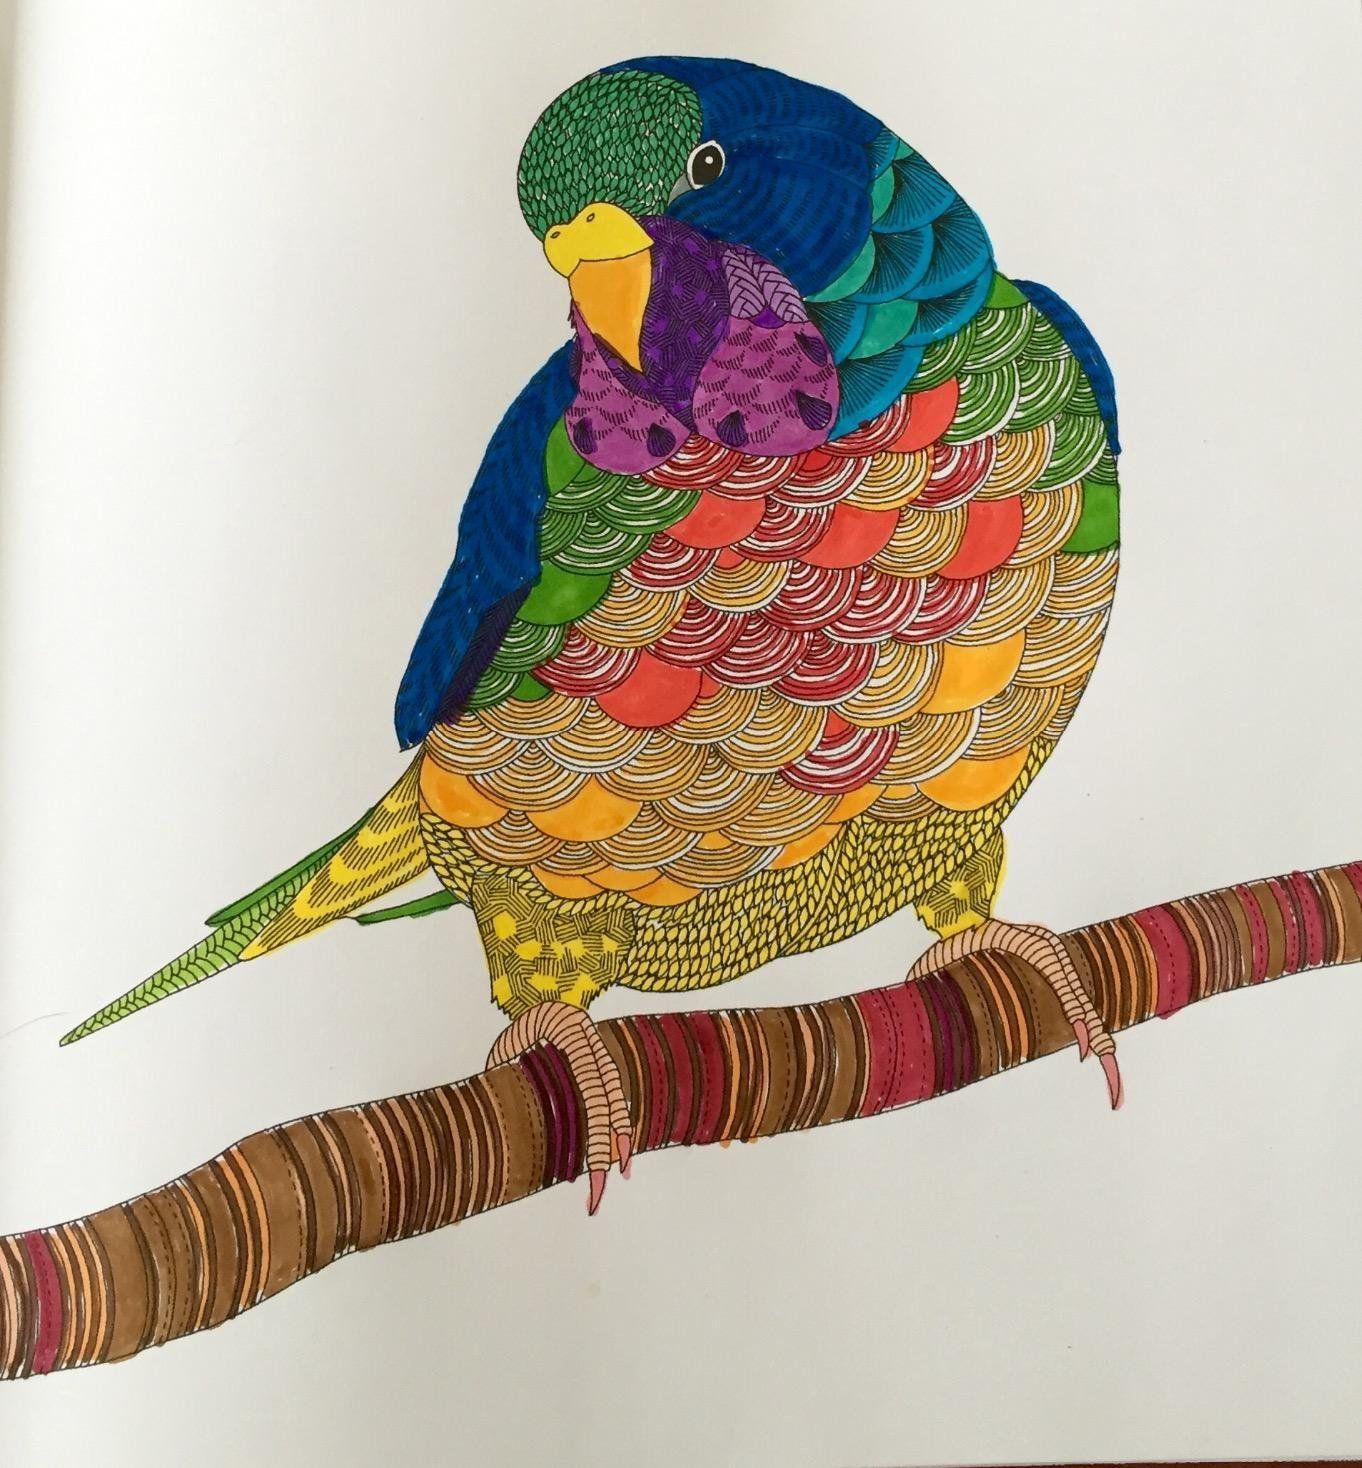 Color me draw me animal kingdom book - Amazon Com Animal Kingdom Color Me Draw Me A Millie Marotta